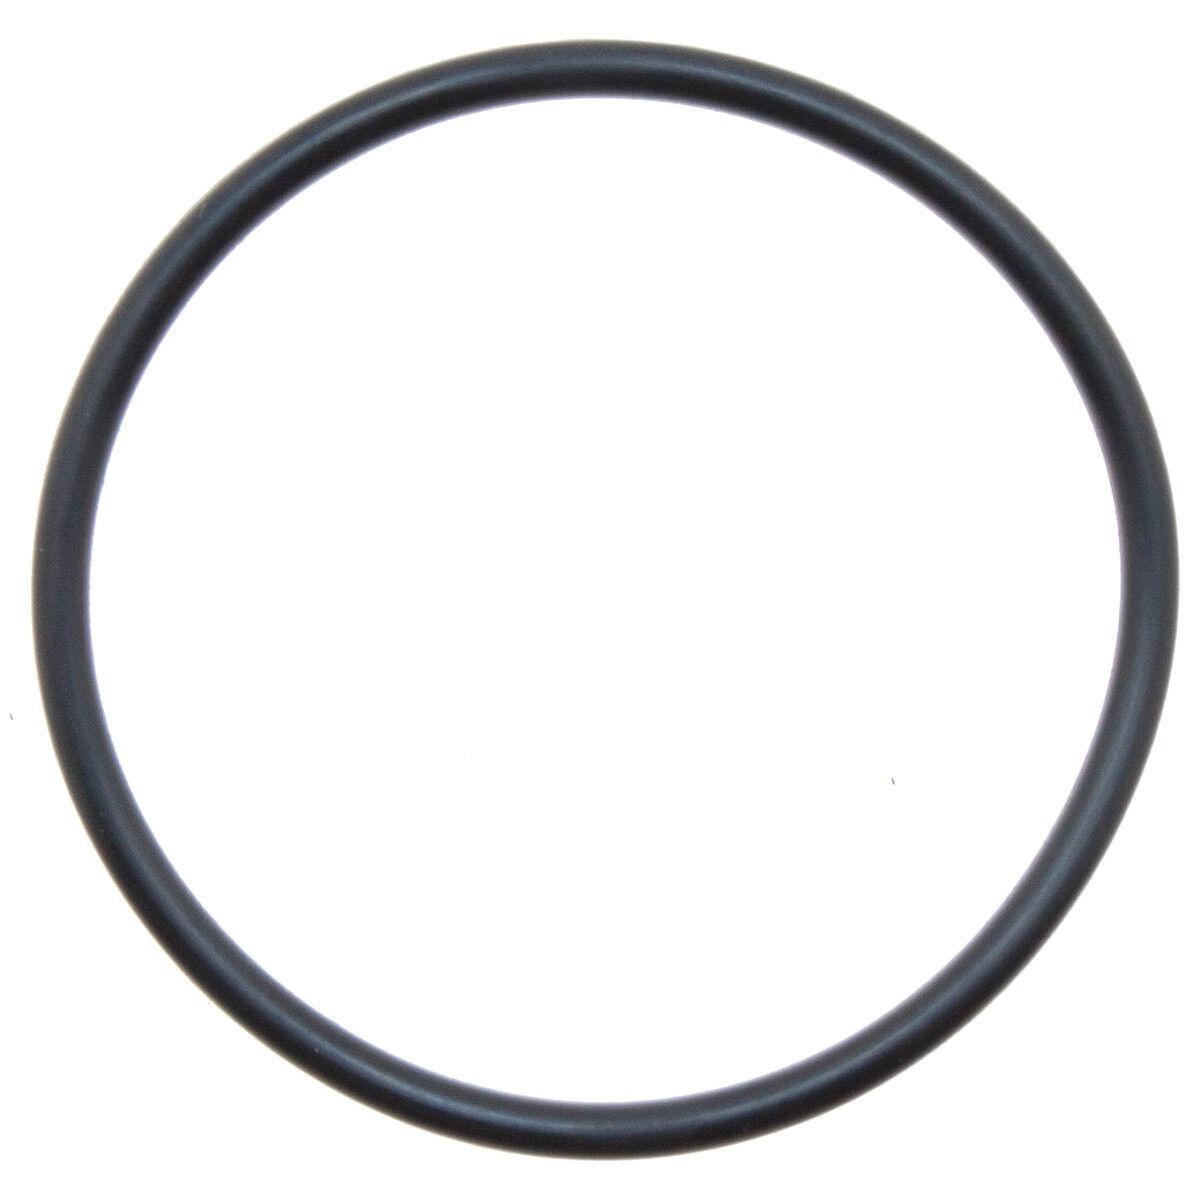 Anillo obturador/O-Ring 50 x 2,5 mm interurbana 80-marrón o negro, negro, negro, cantidad 10 trozo d8b2d3